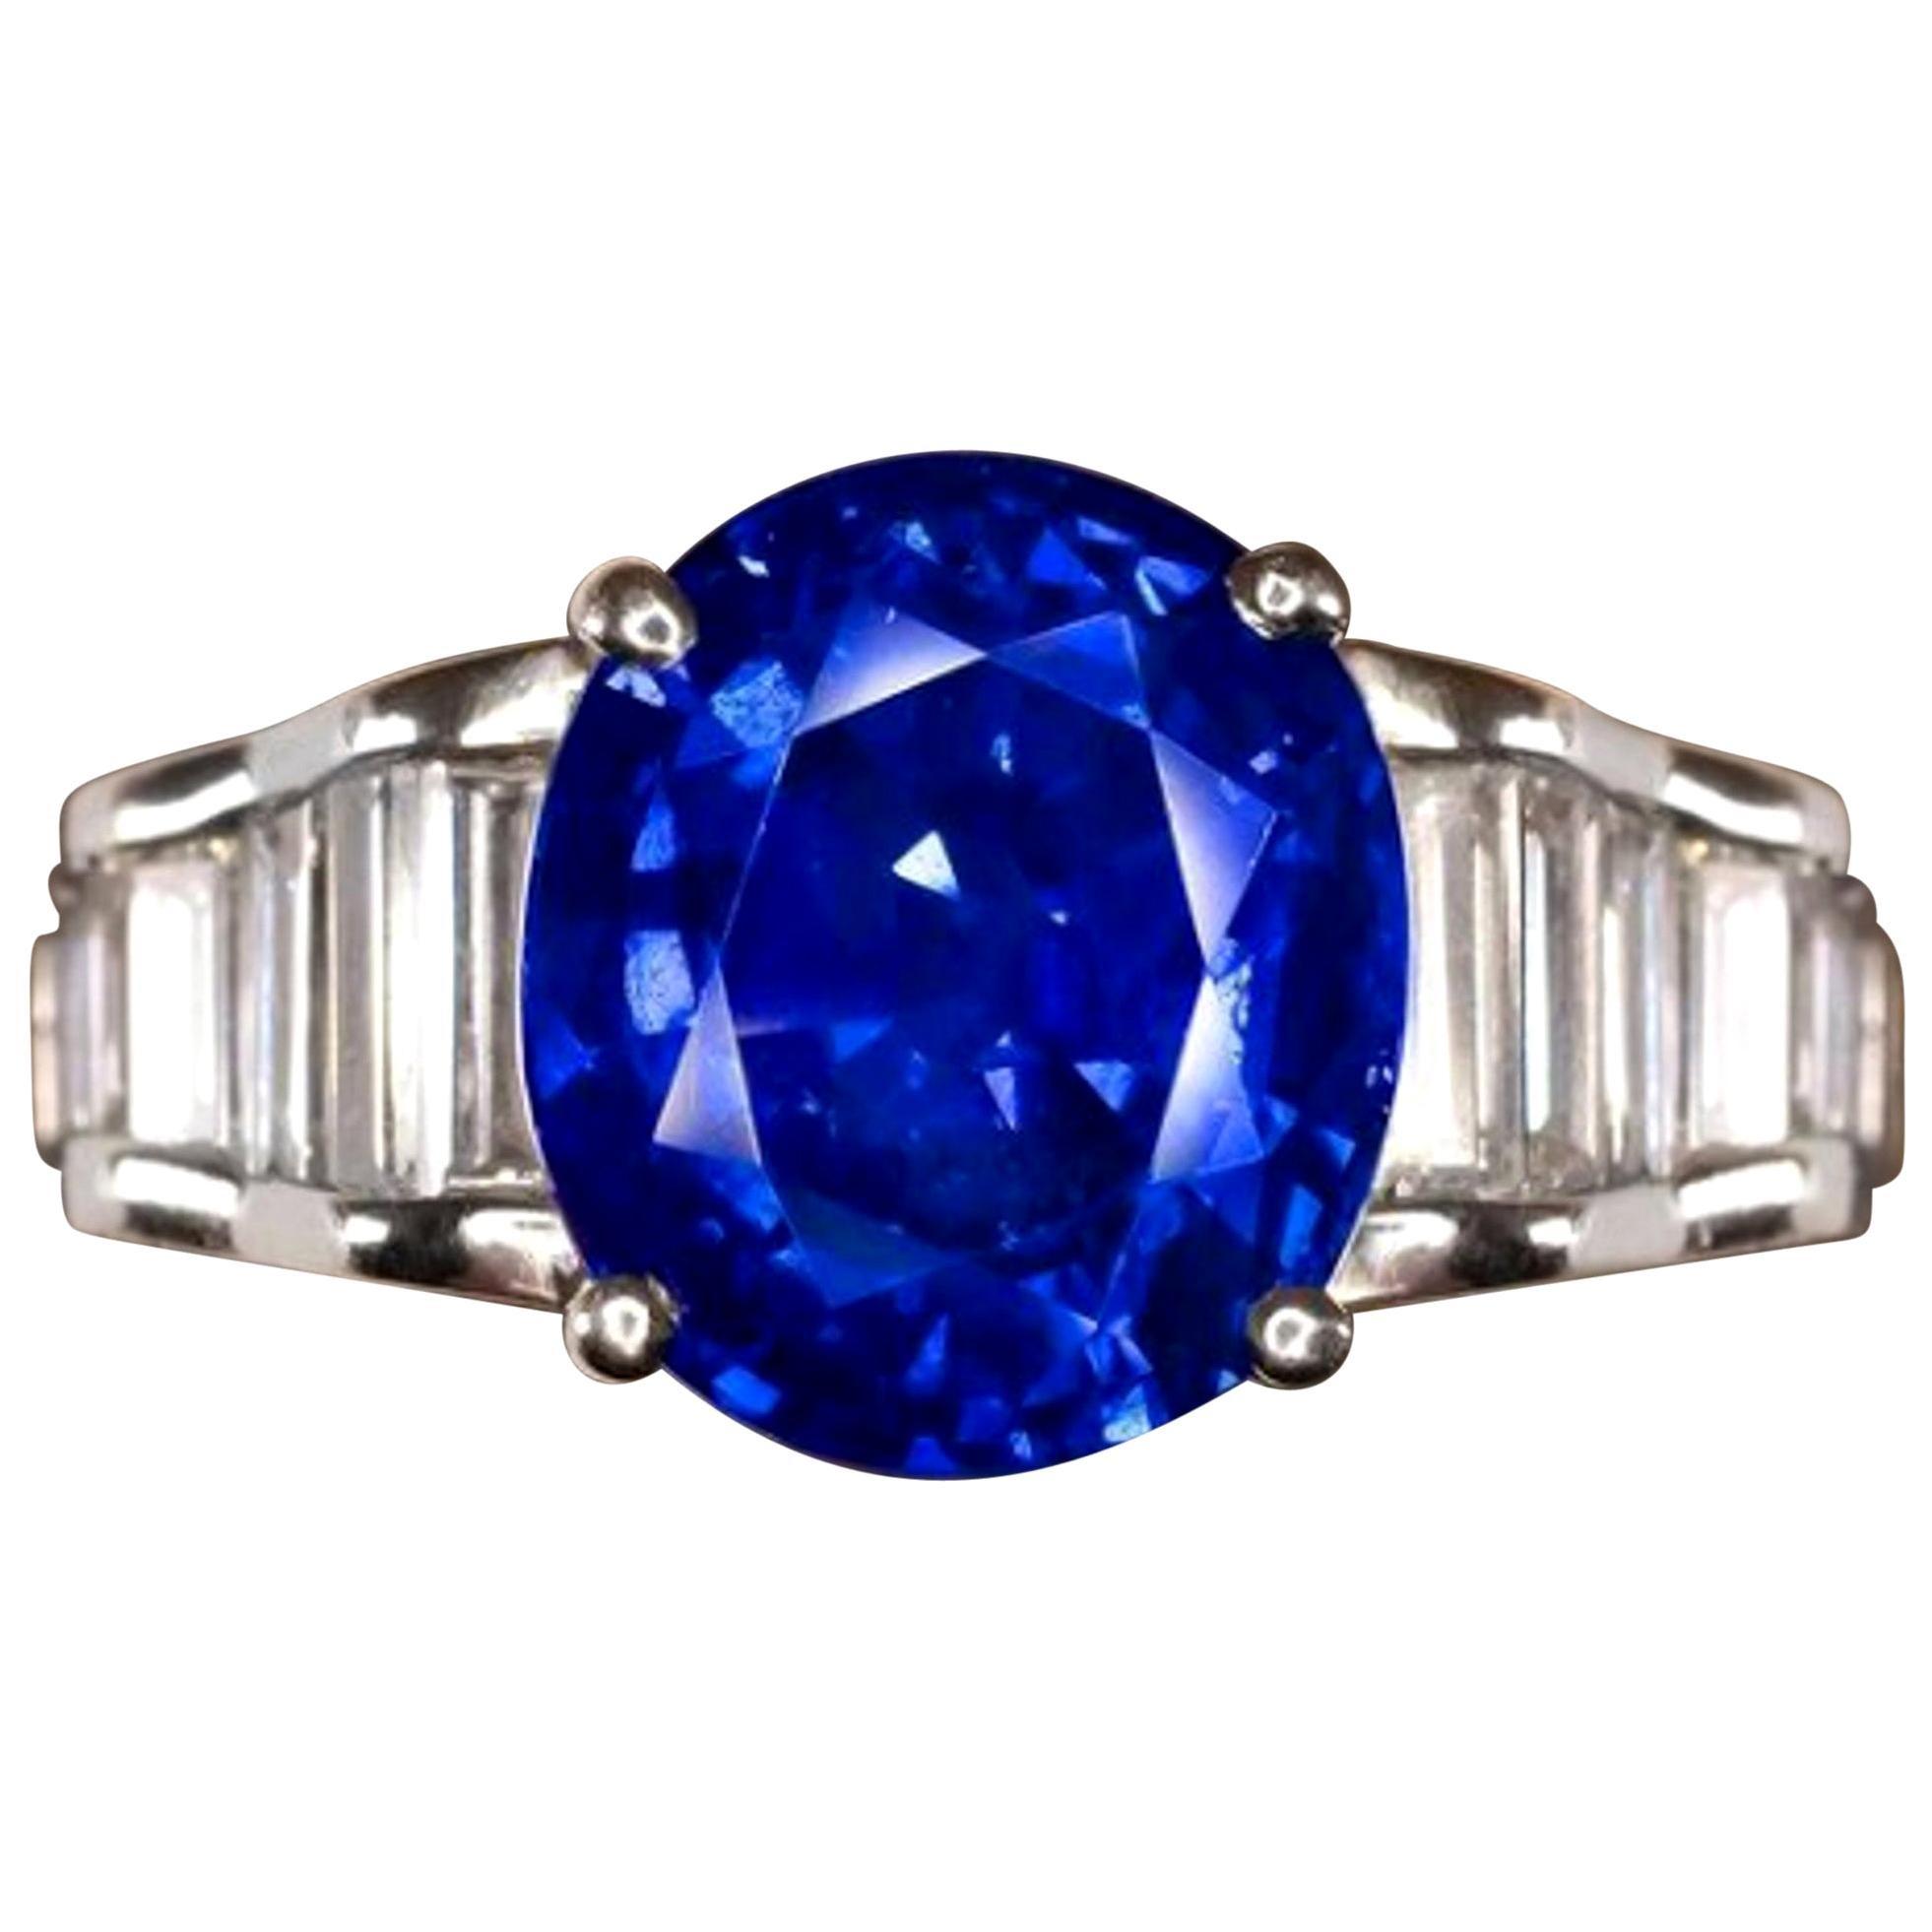 Exceptional Vivid Blue Royal Blue GRS GIA Certified 5.30 Carat Blue Sapphire